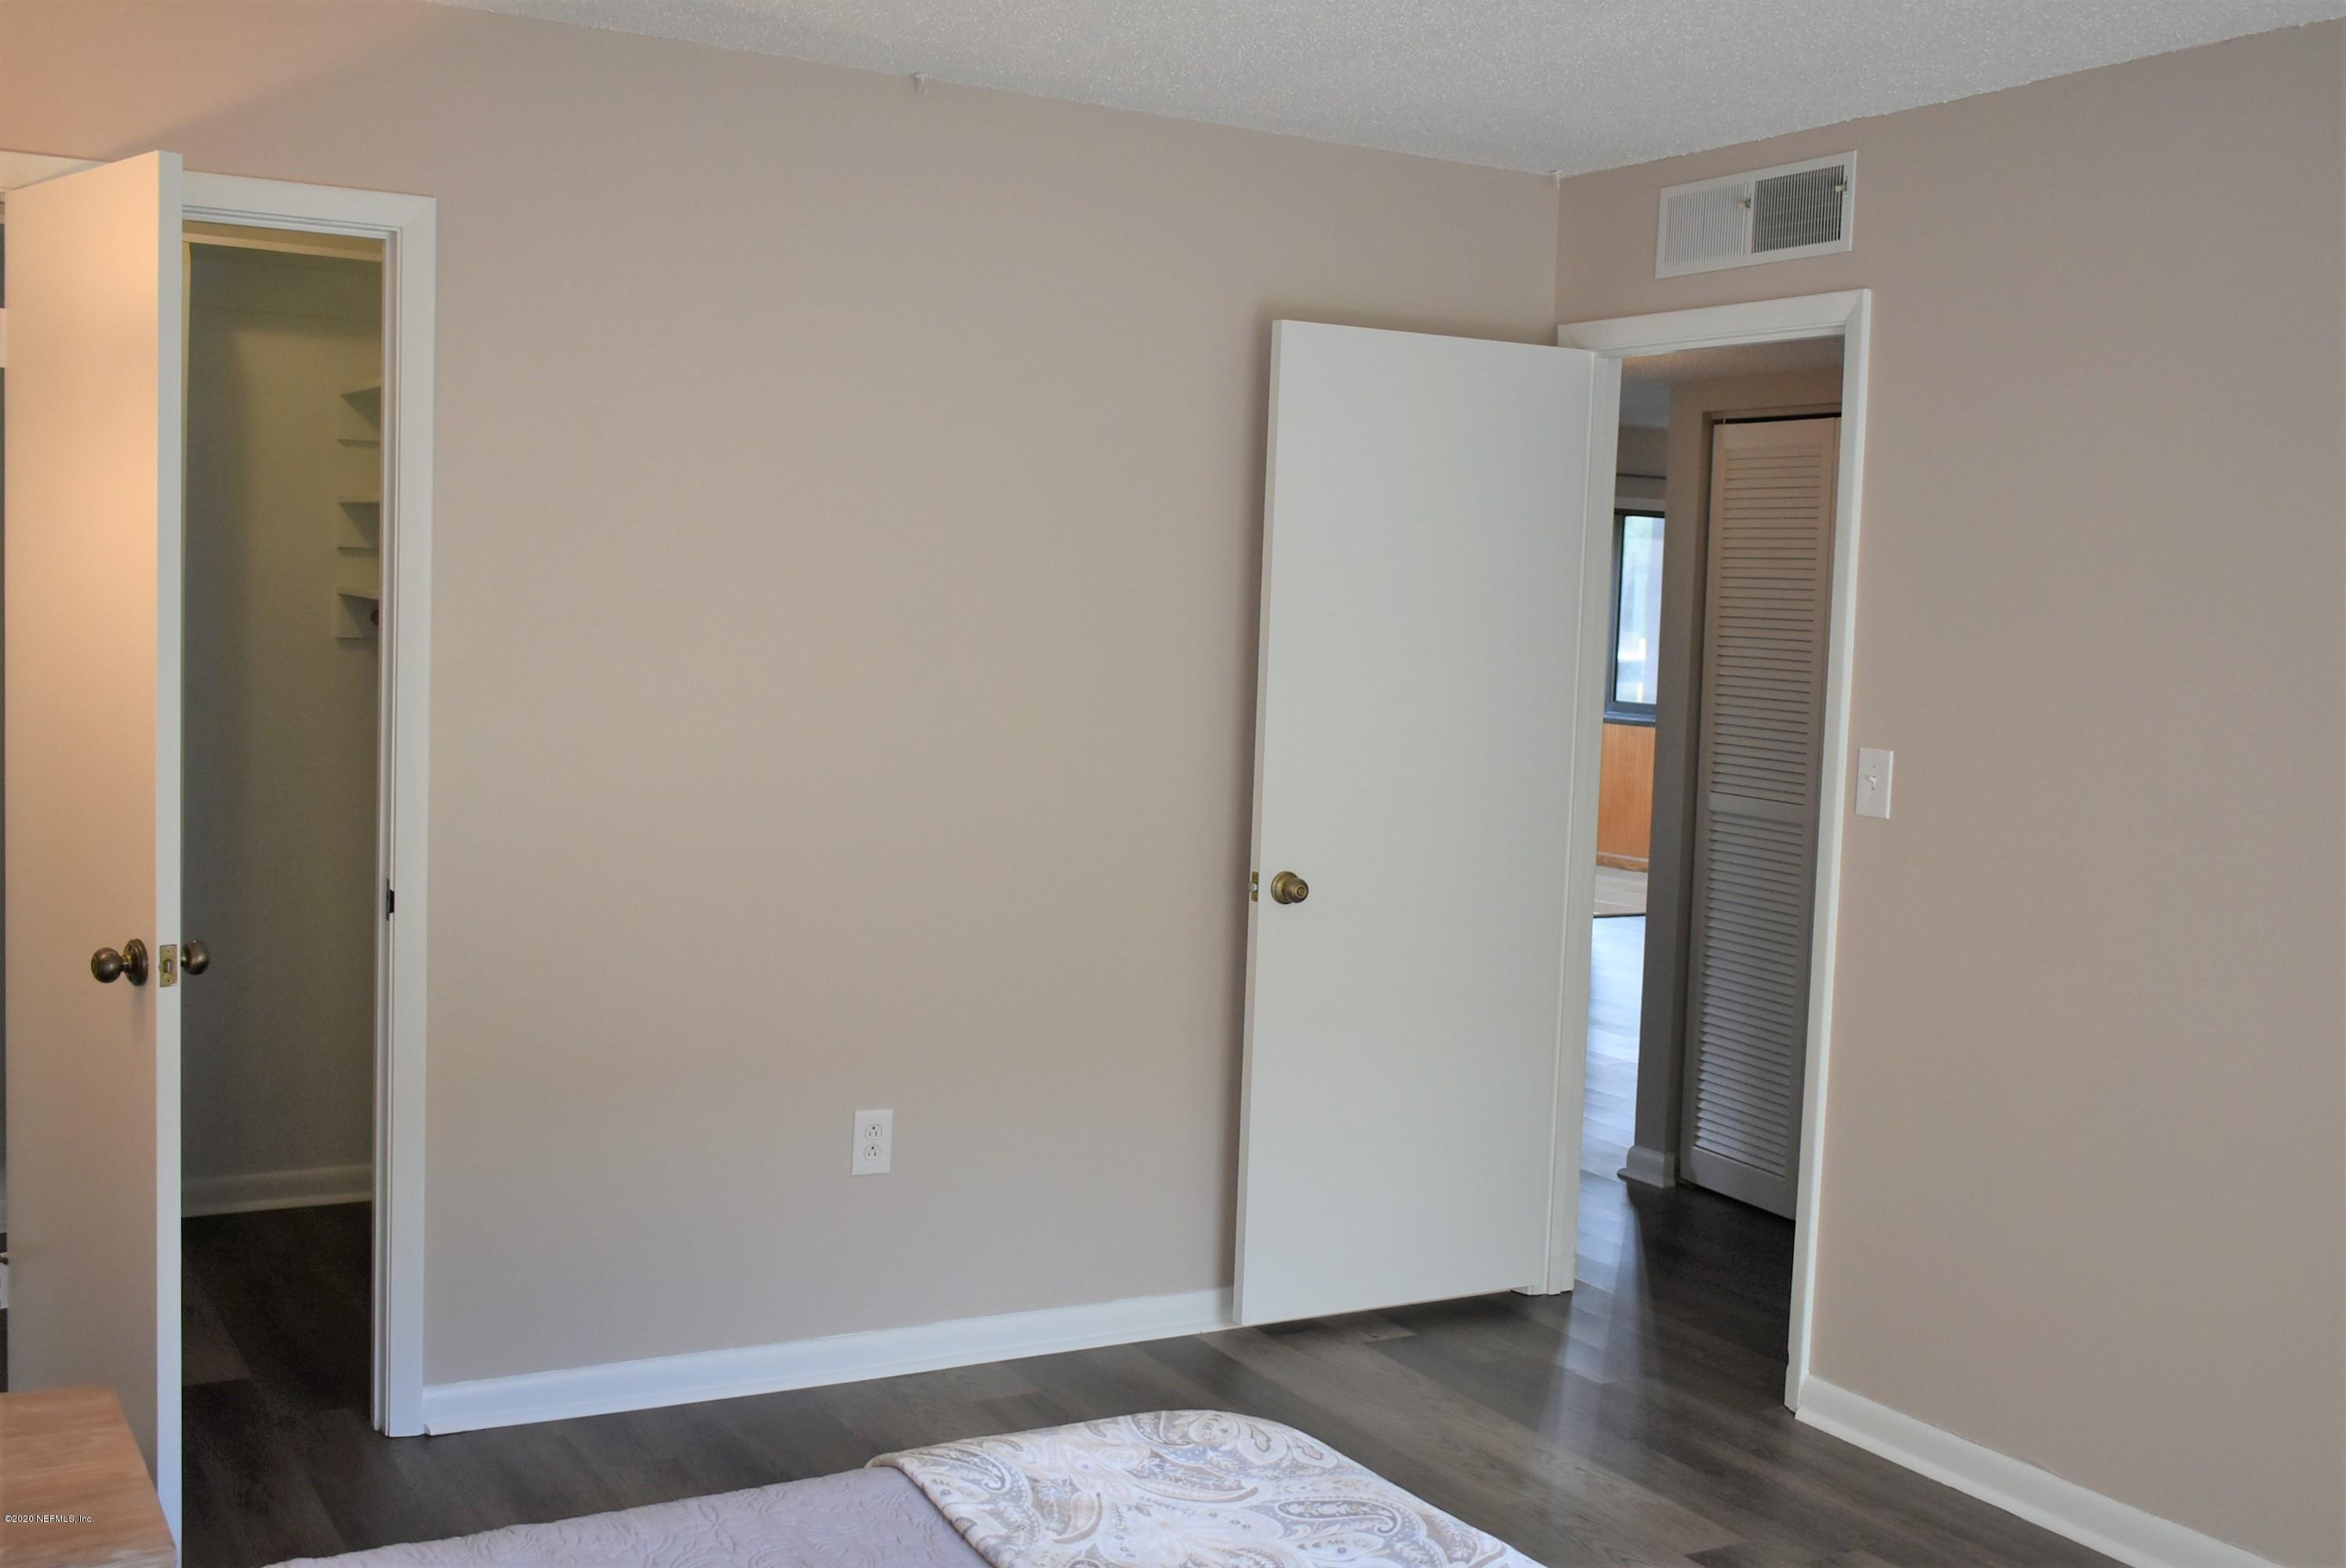 5400 LAMOYA, JACKSONVILLE, FLORIDA 32210, 2 Bedrooms Bedrooms, ,2 BathroomsBathrooms,Residential,For sale,LAMOYA,1039106